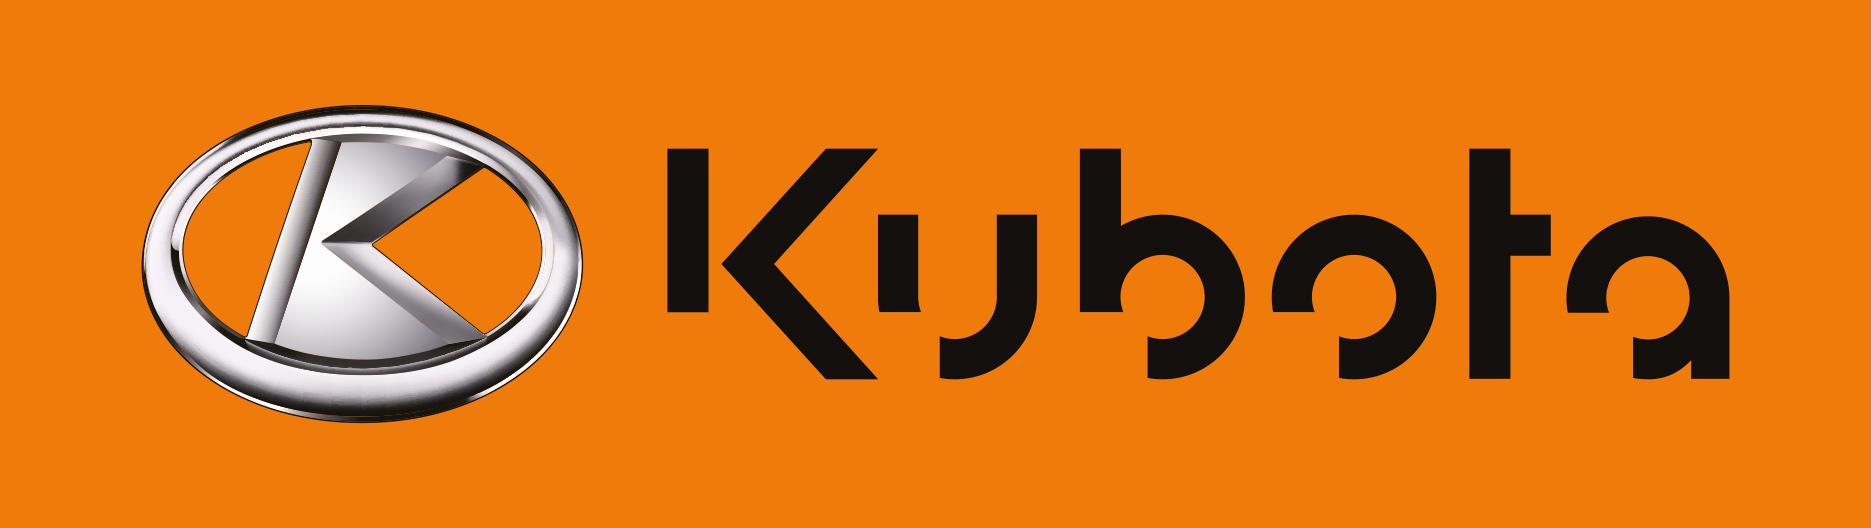 logo_orange_k_horizontal_586f94a456d78.jpg